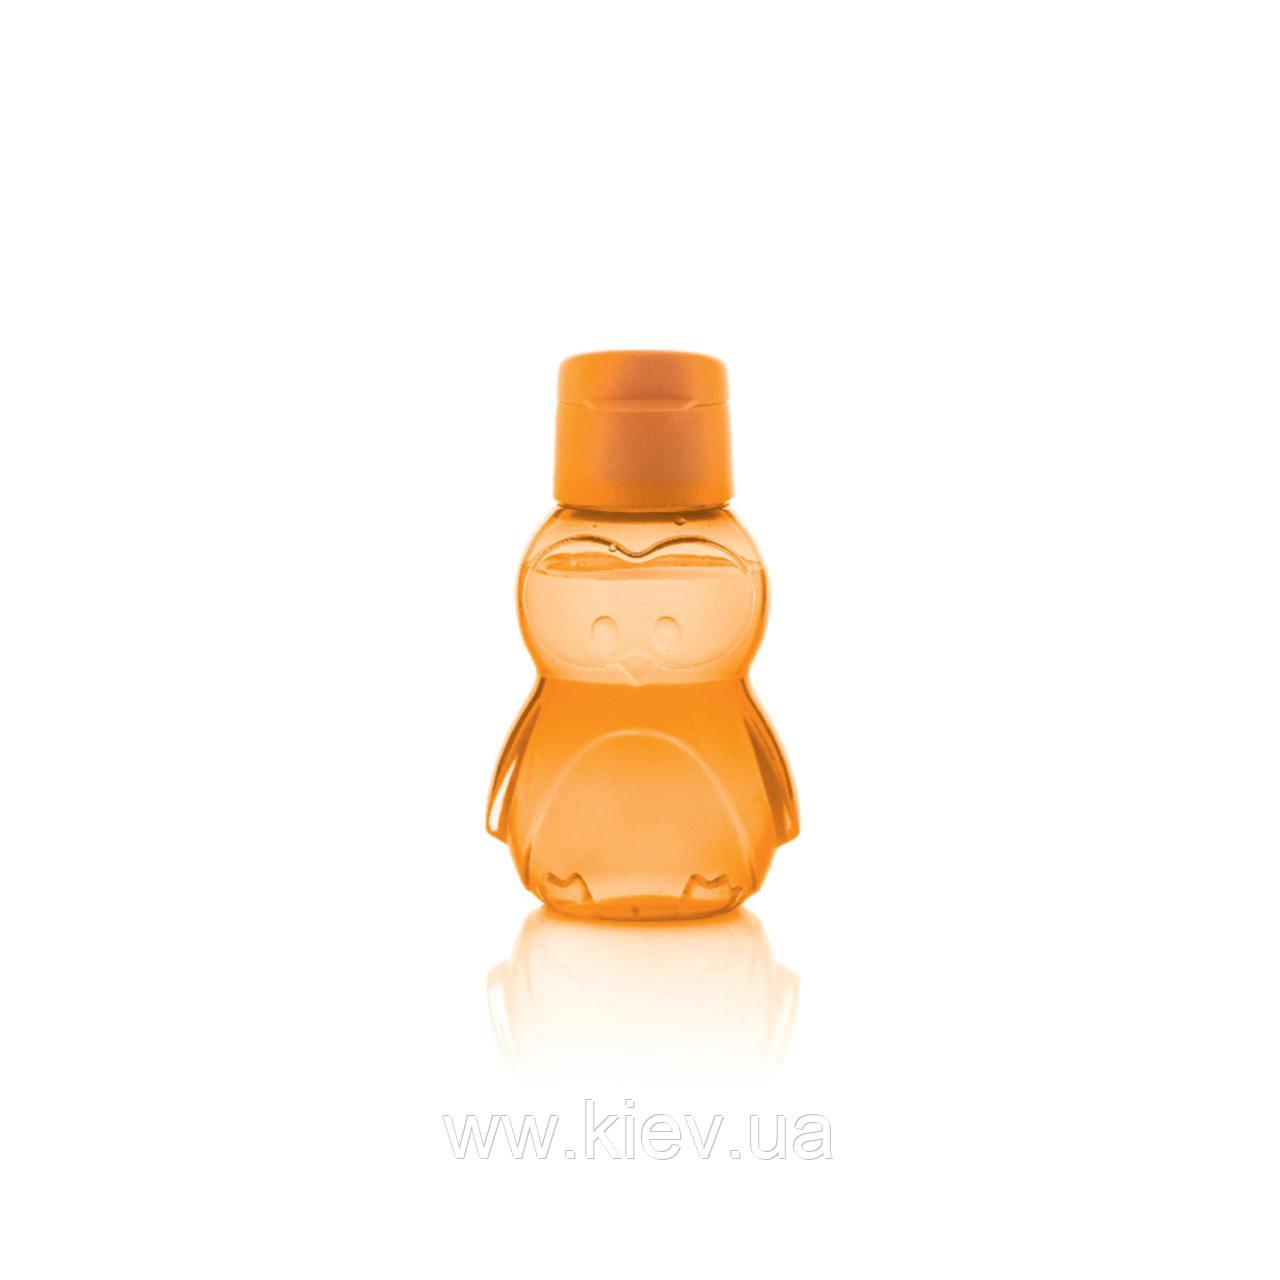 Эко-бутылка «Пингвинёнок» (350 мл), многоразовая бутылка для воды Tupperware